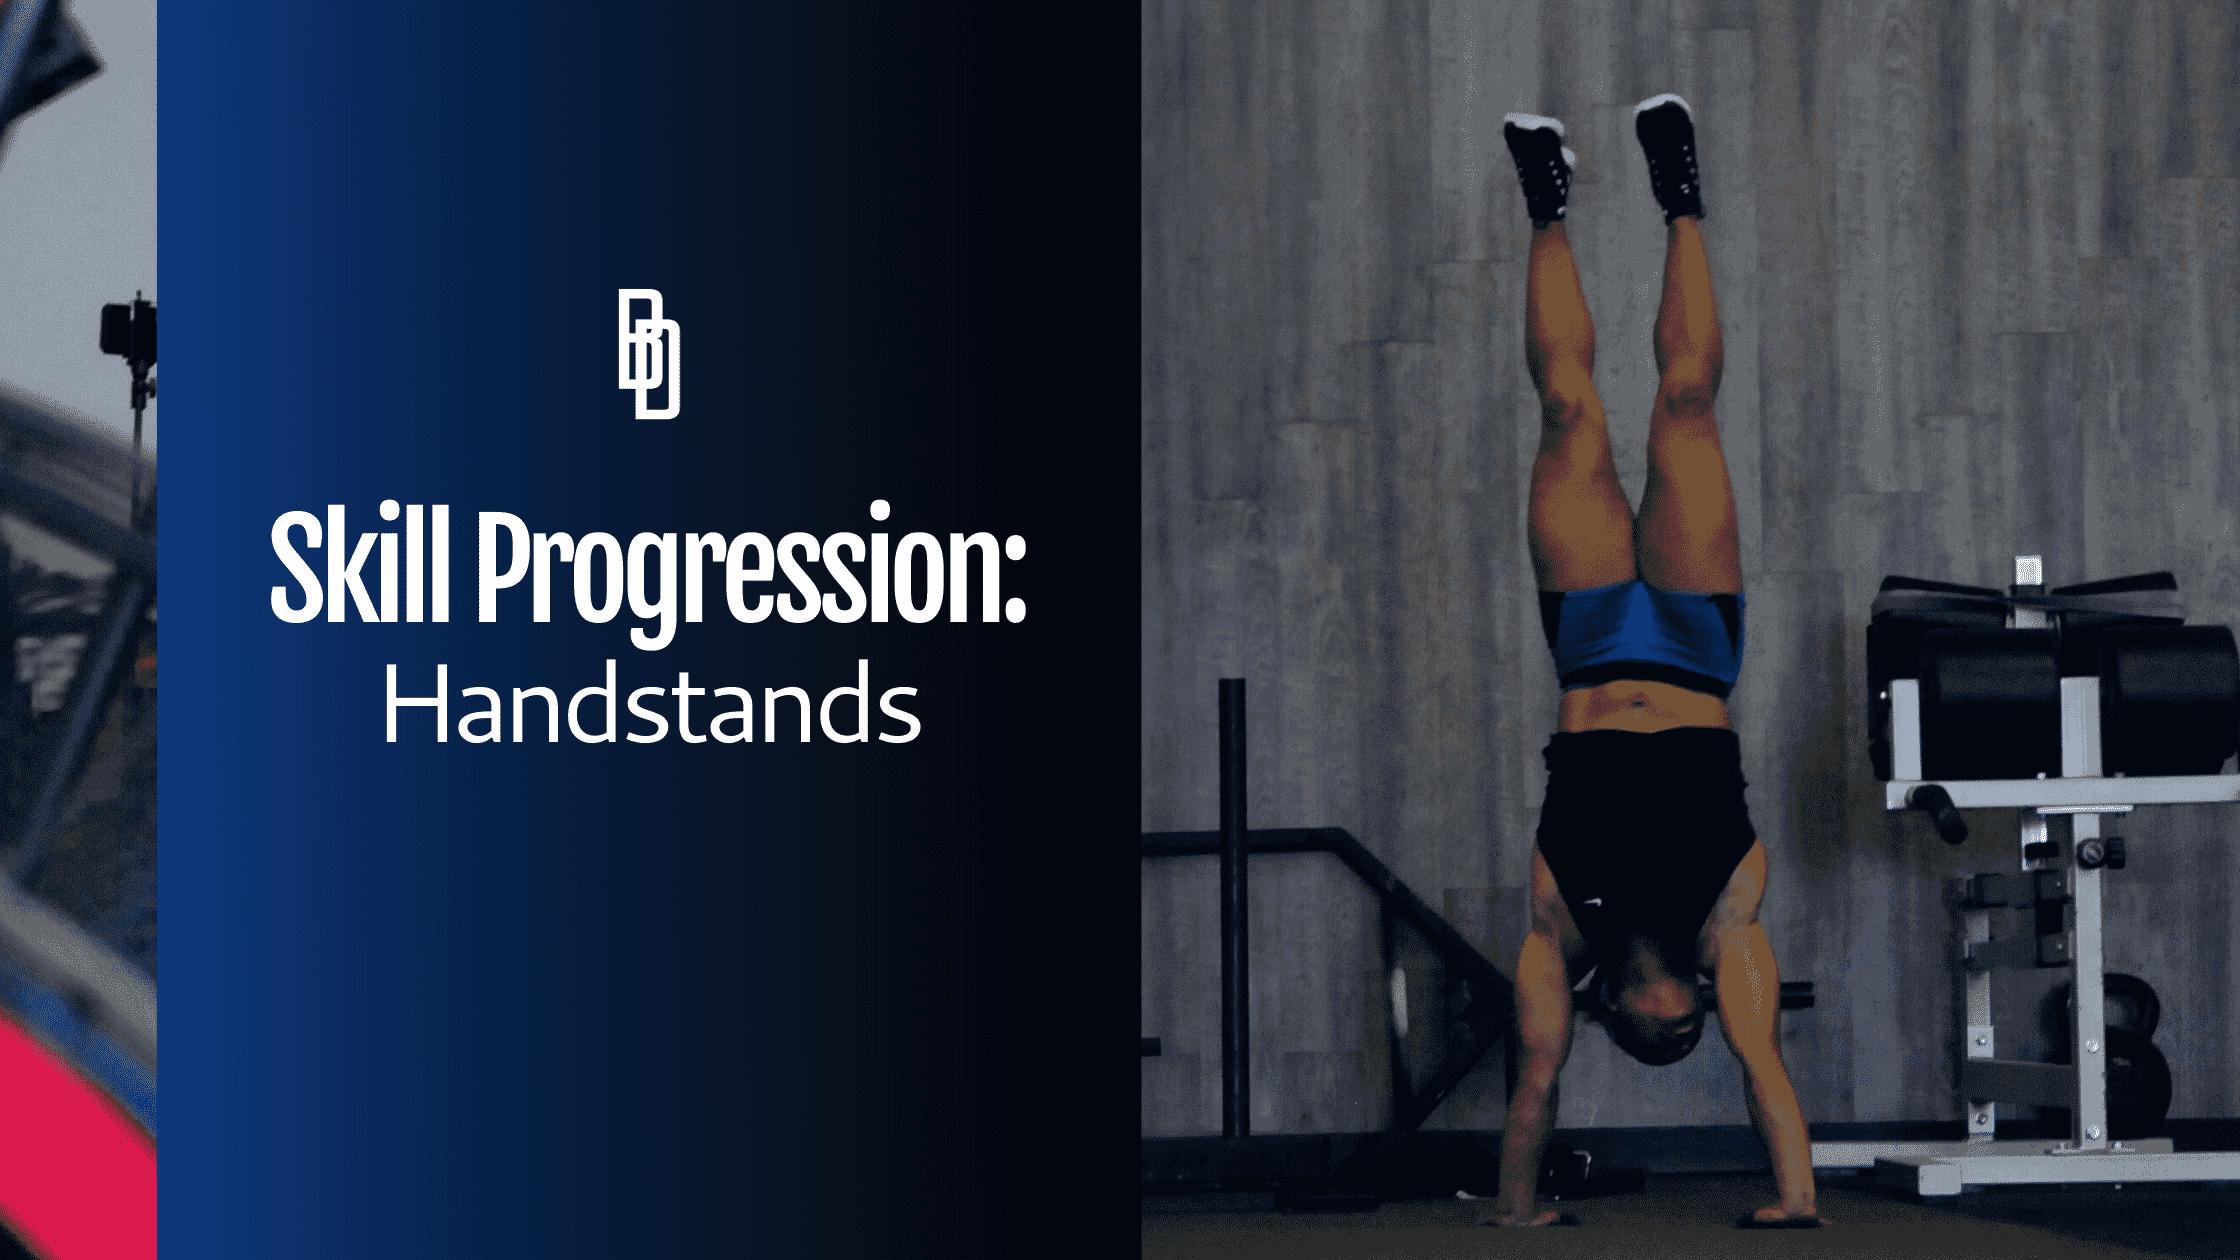 Skill Progression: Handstands